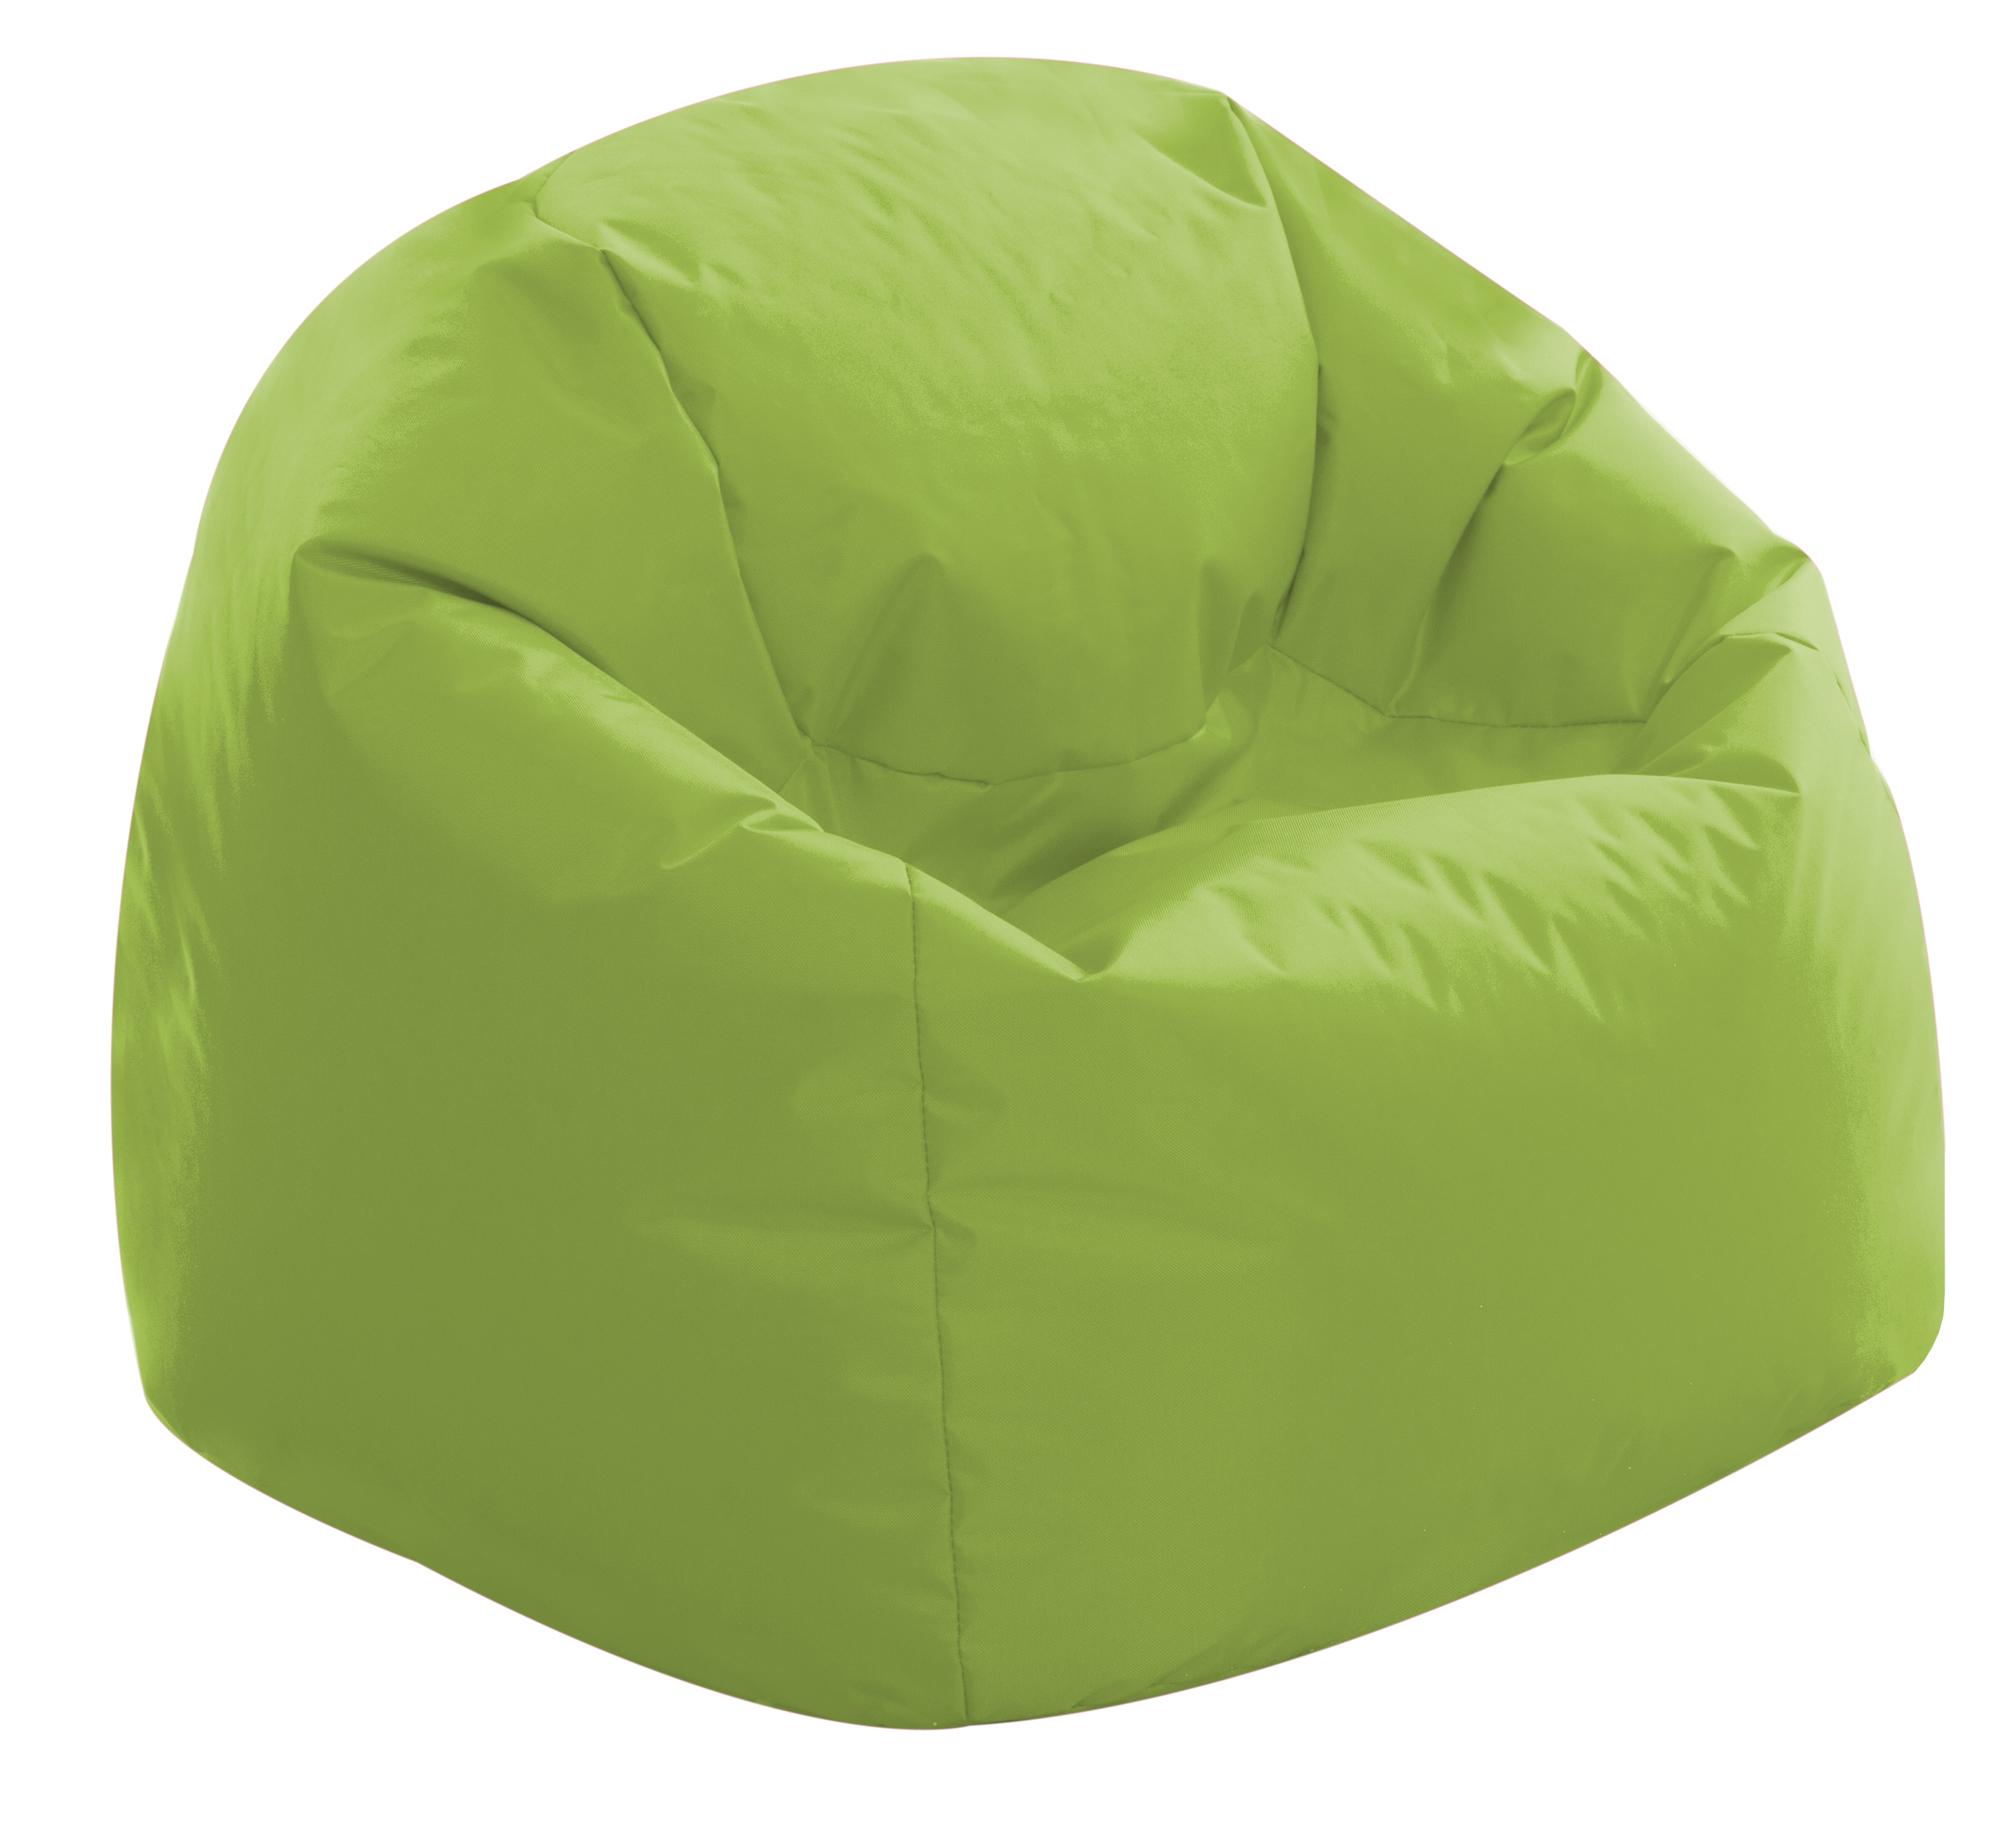 Eden-Primary-Bean-Bag-Lime-300dpi-1